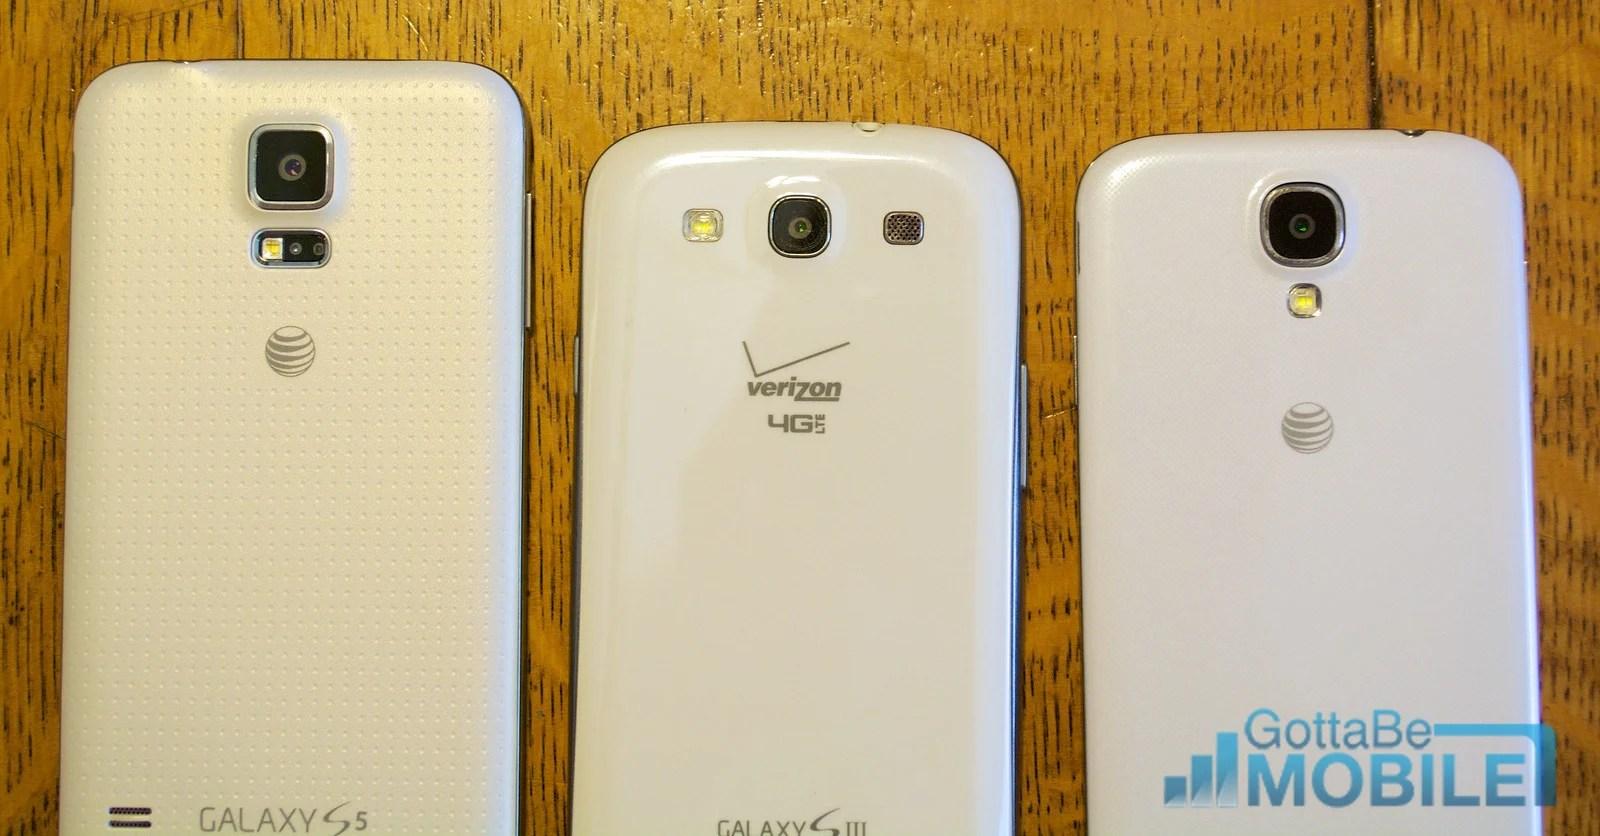 Samsung galaxy battery s3 verizon - Samsung Galaxy S5 Vs Galaxy S3 Vs Galaxy S4 Cameras